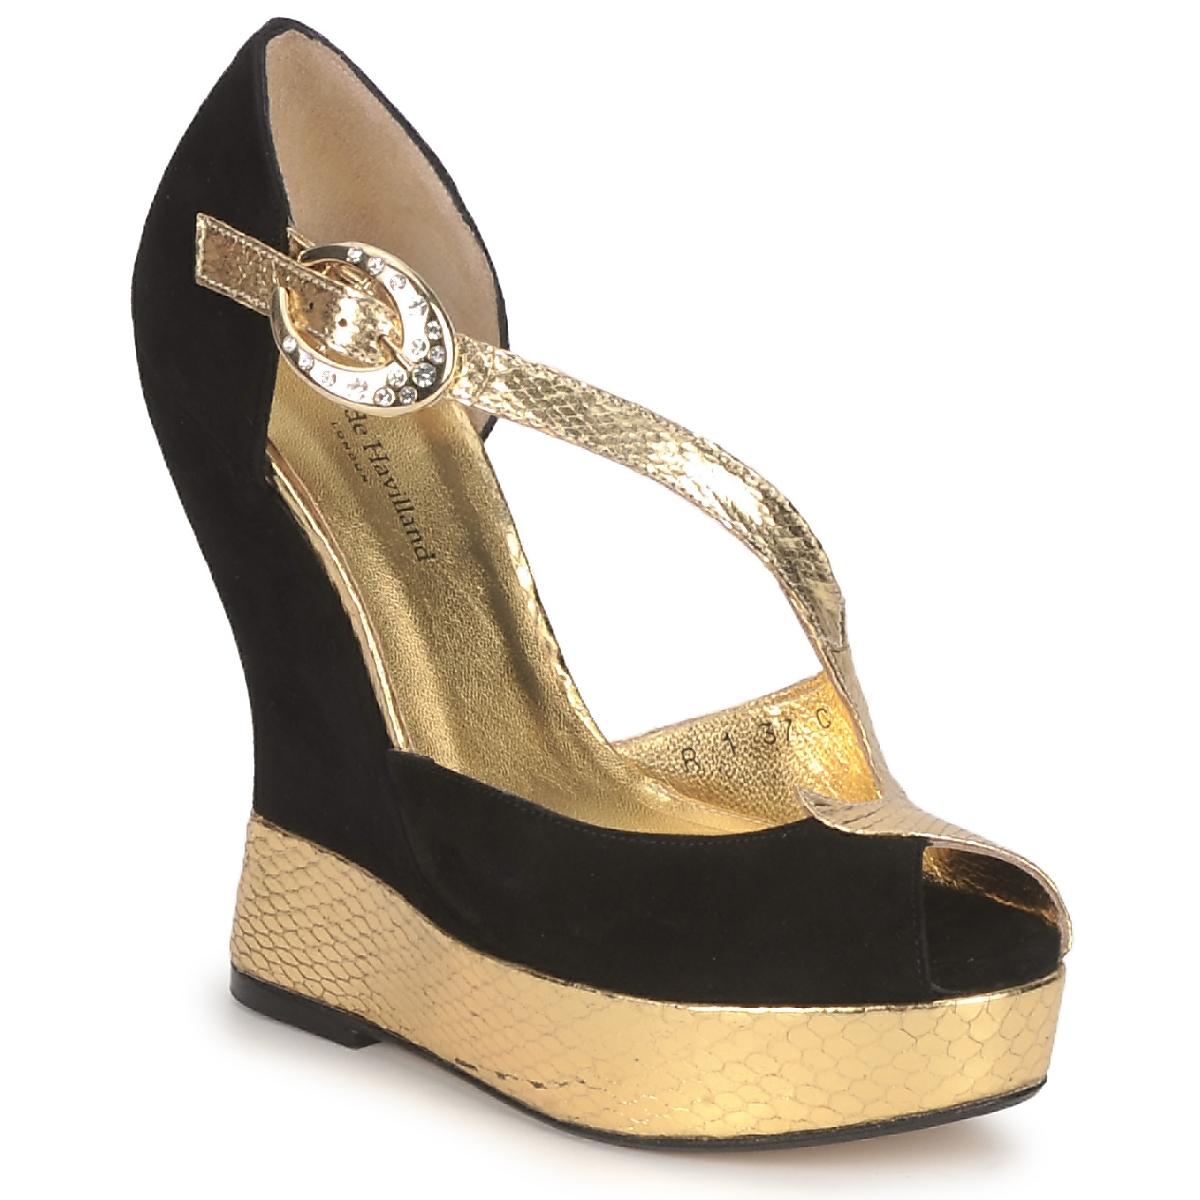 Terry de Havilland PENNY BLACK-GOLD